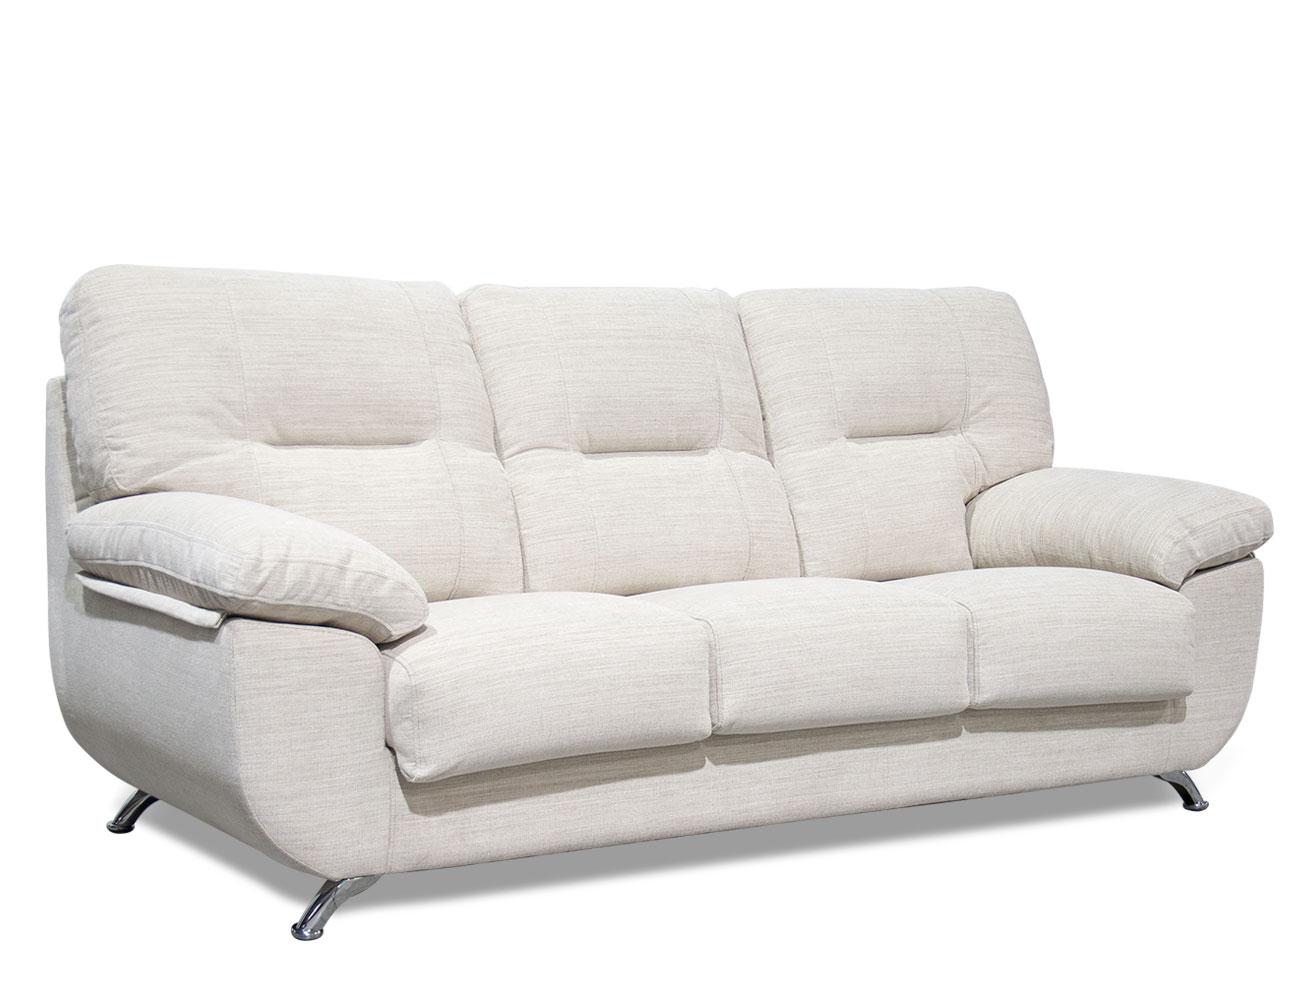 Sofa 3 asientos 214 cm